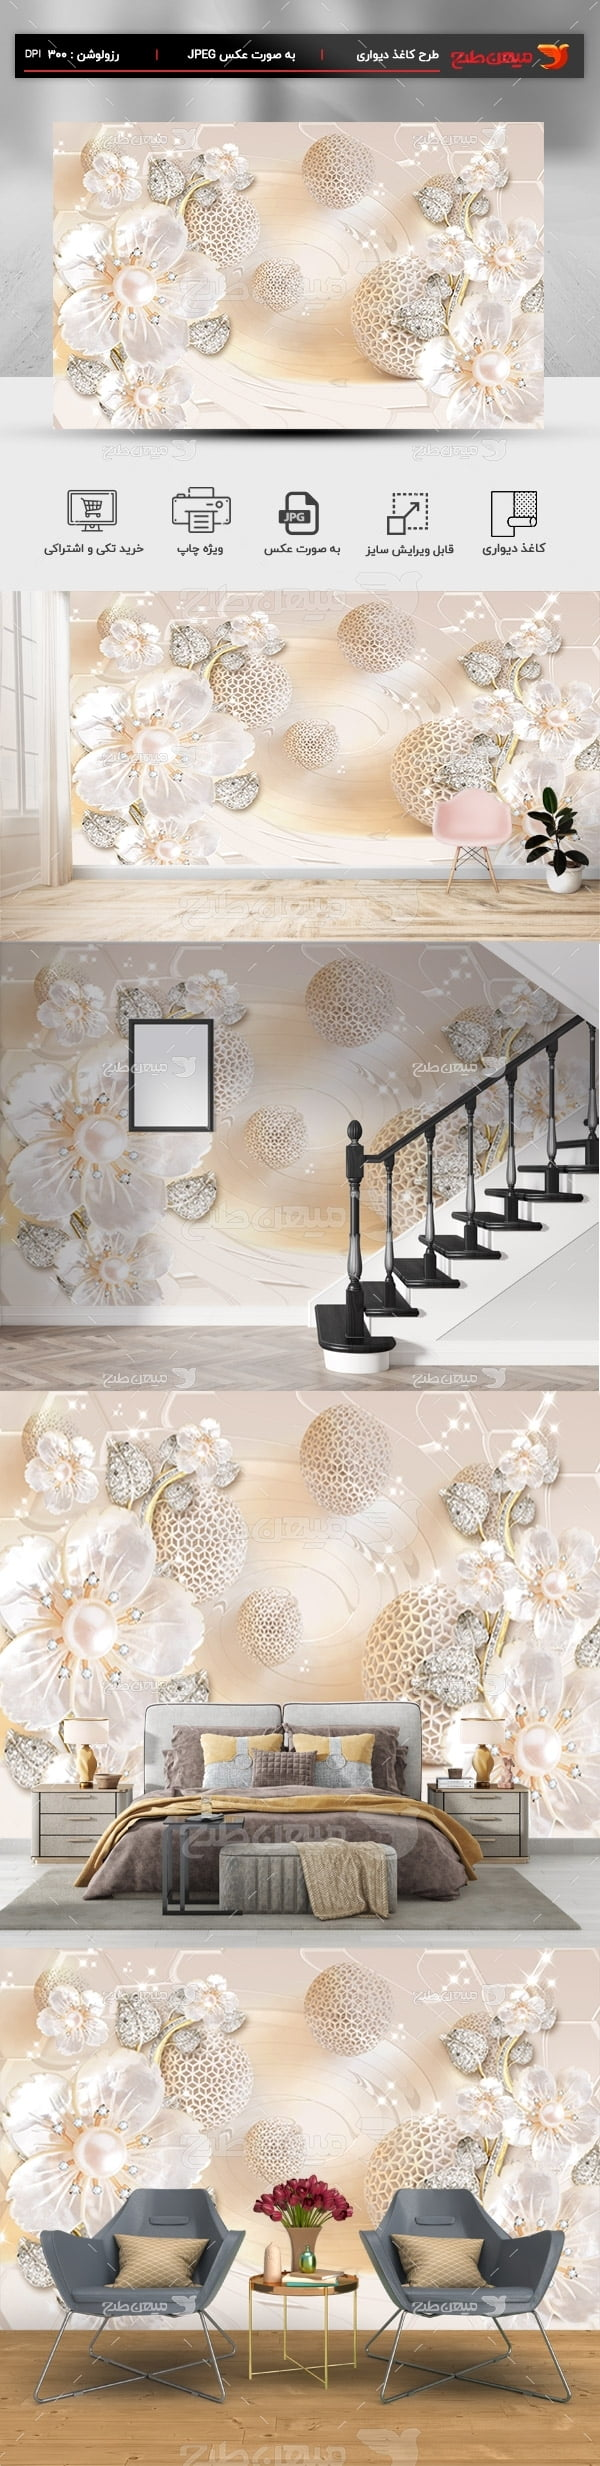 پوستر کاغذ دیواری سه بعدی طرح گل نگین مرواید